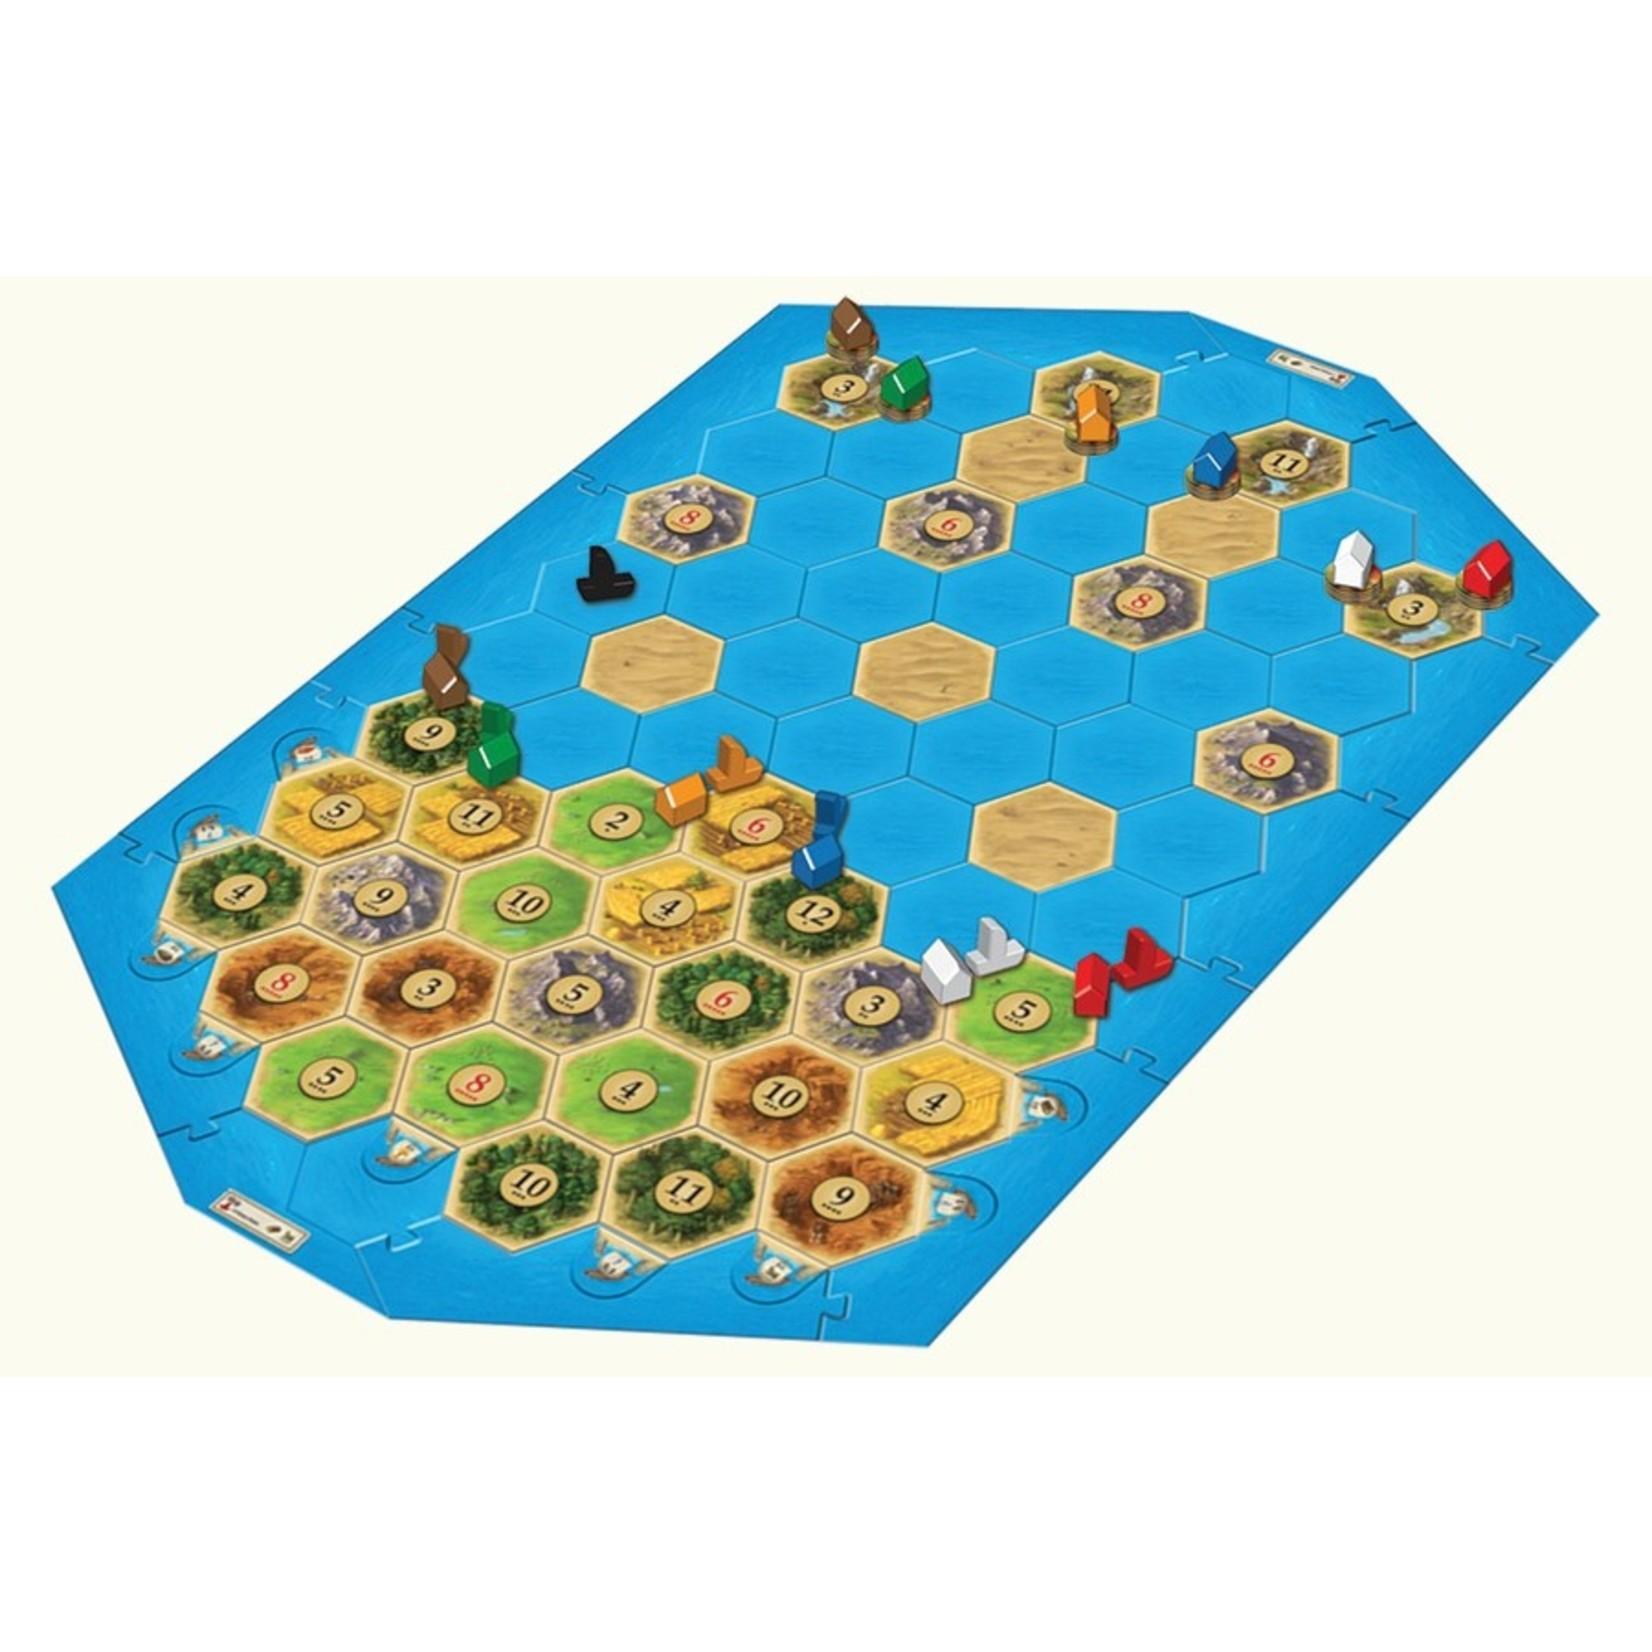 Catan Studios Inc. Catan: Seafarers 5-6 Player Extension